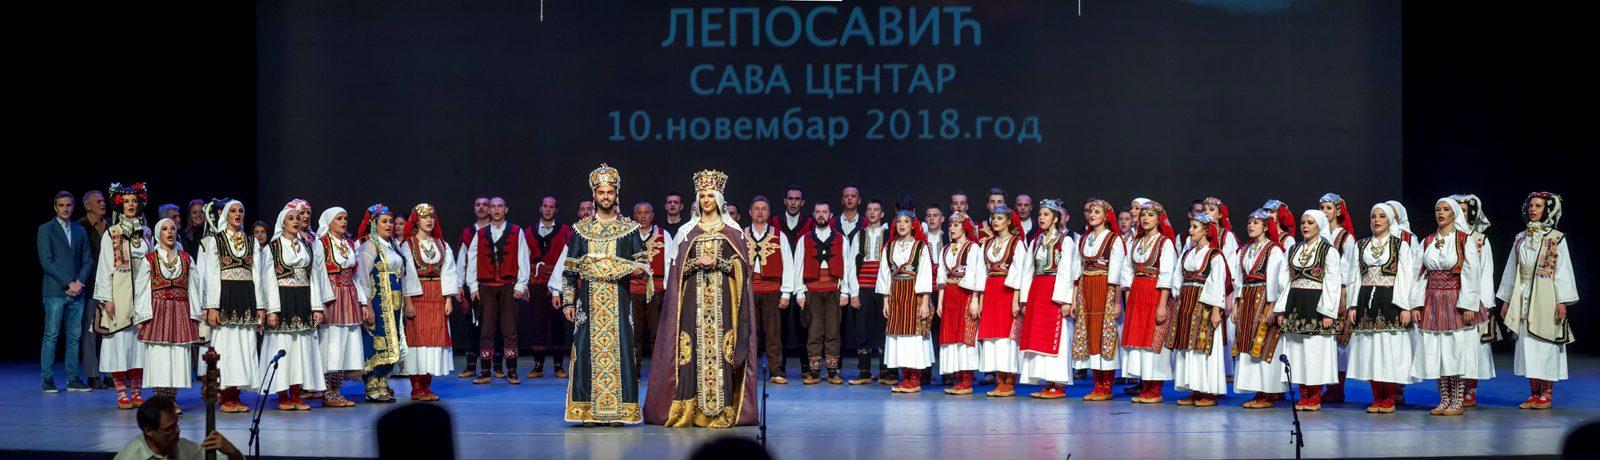 КУД Копаоник Лепосавић